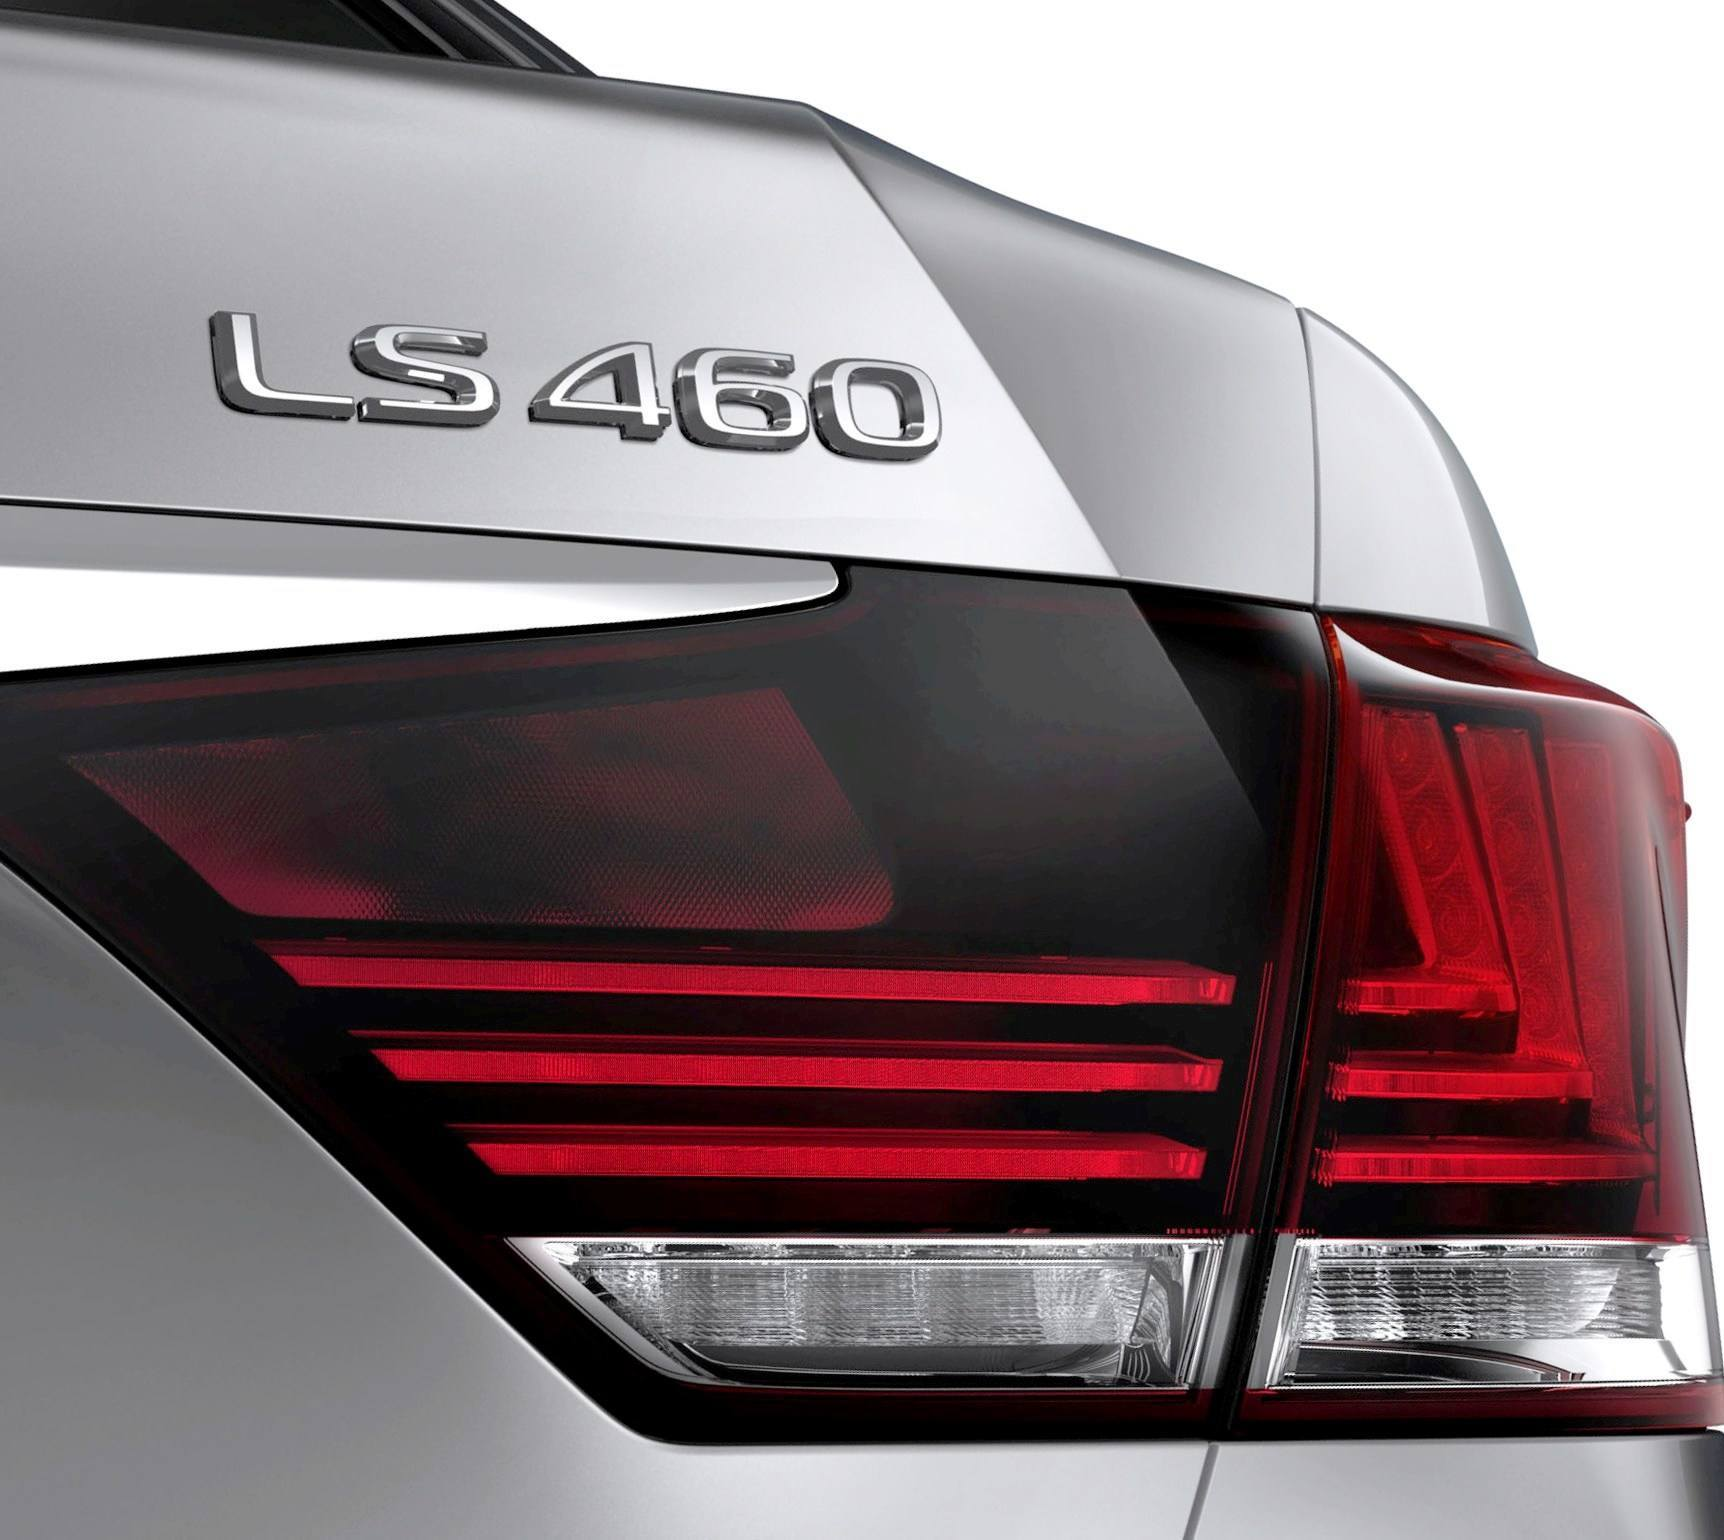 2013 Lexus 460 For Sale: Easiest Luxury Limo